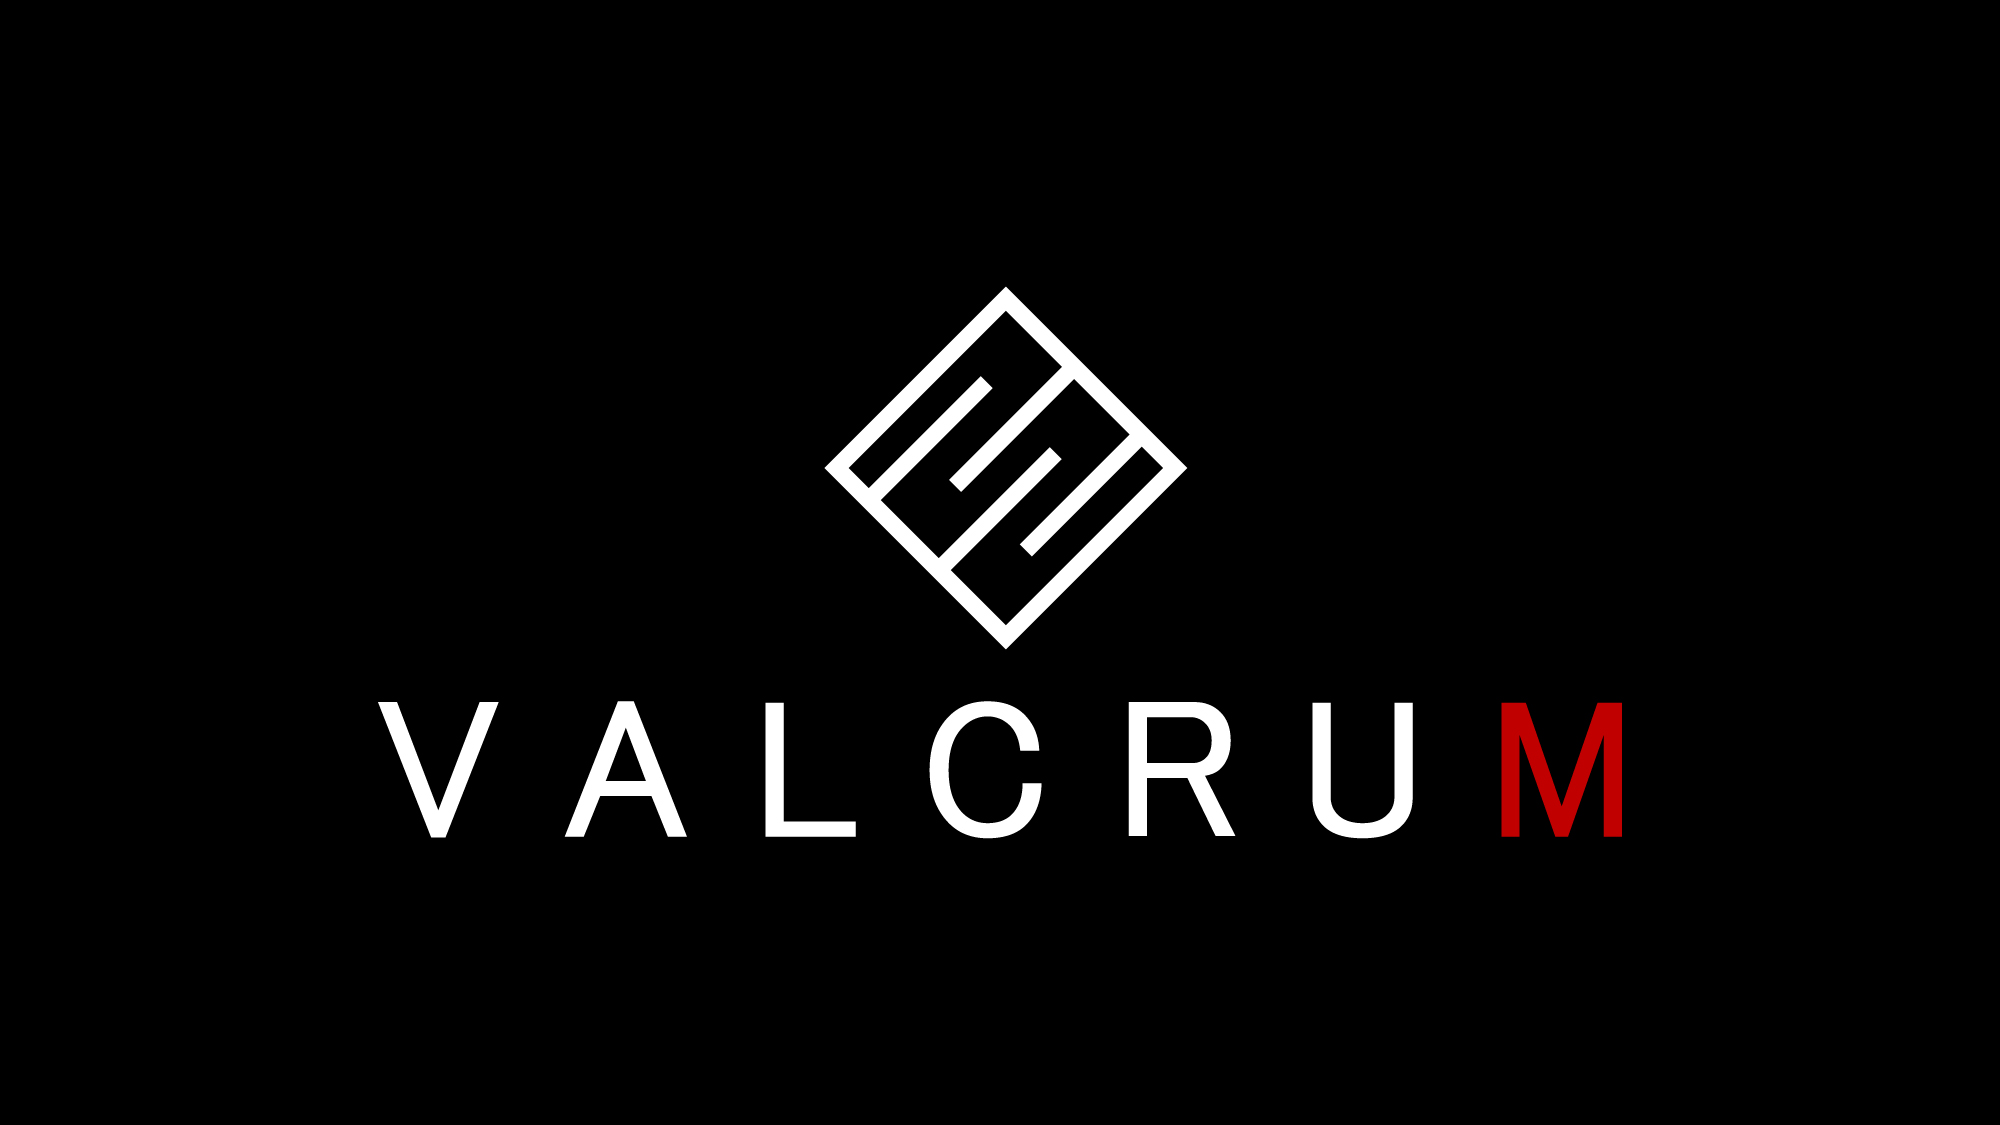 Valcrum